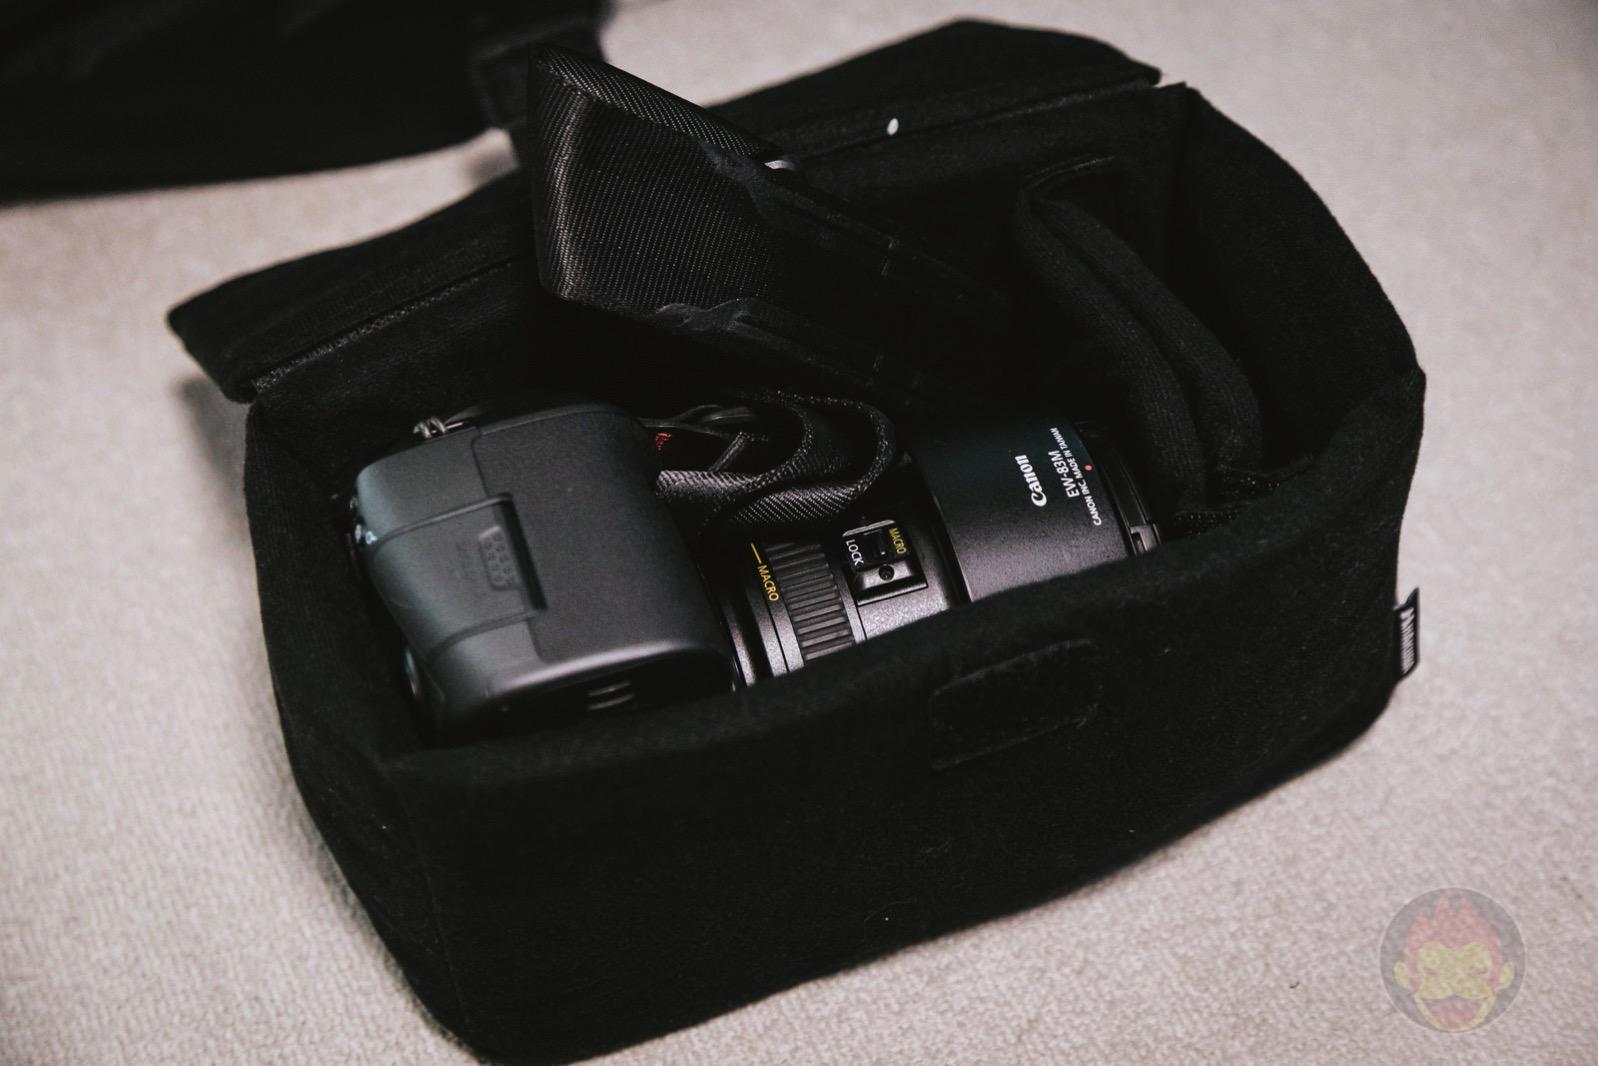 Hakuba-Camerabag-Innerbox-Review-01.jpg